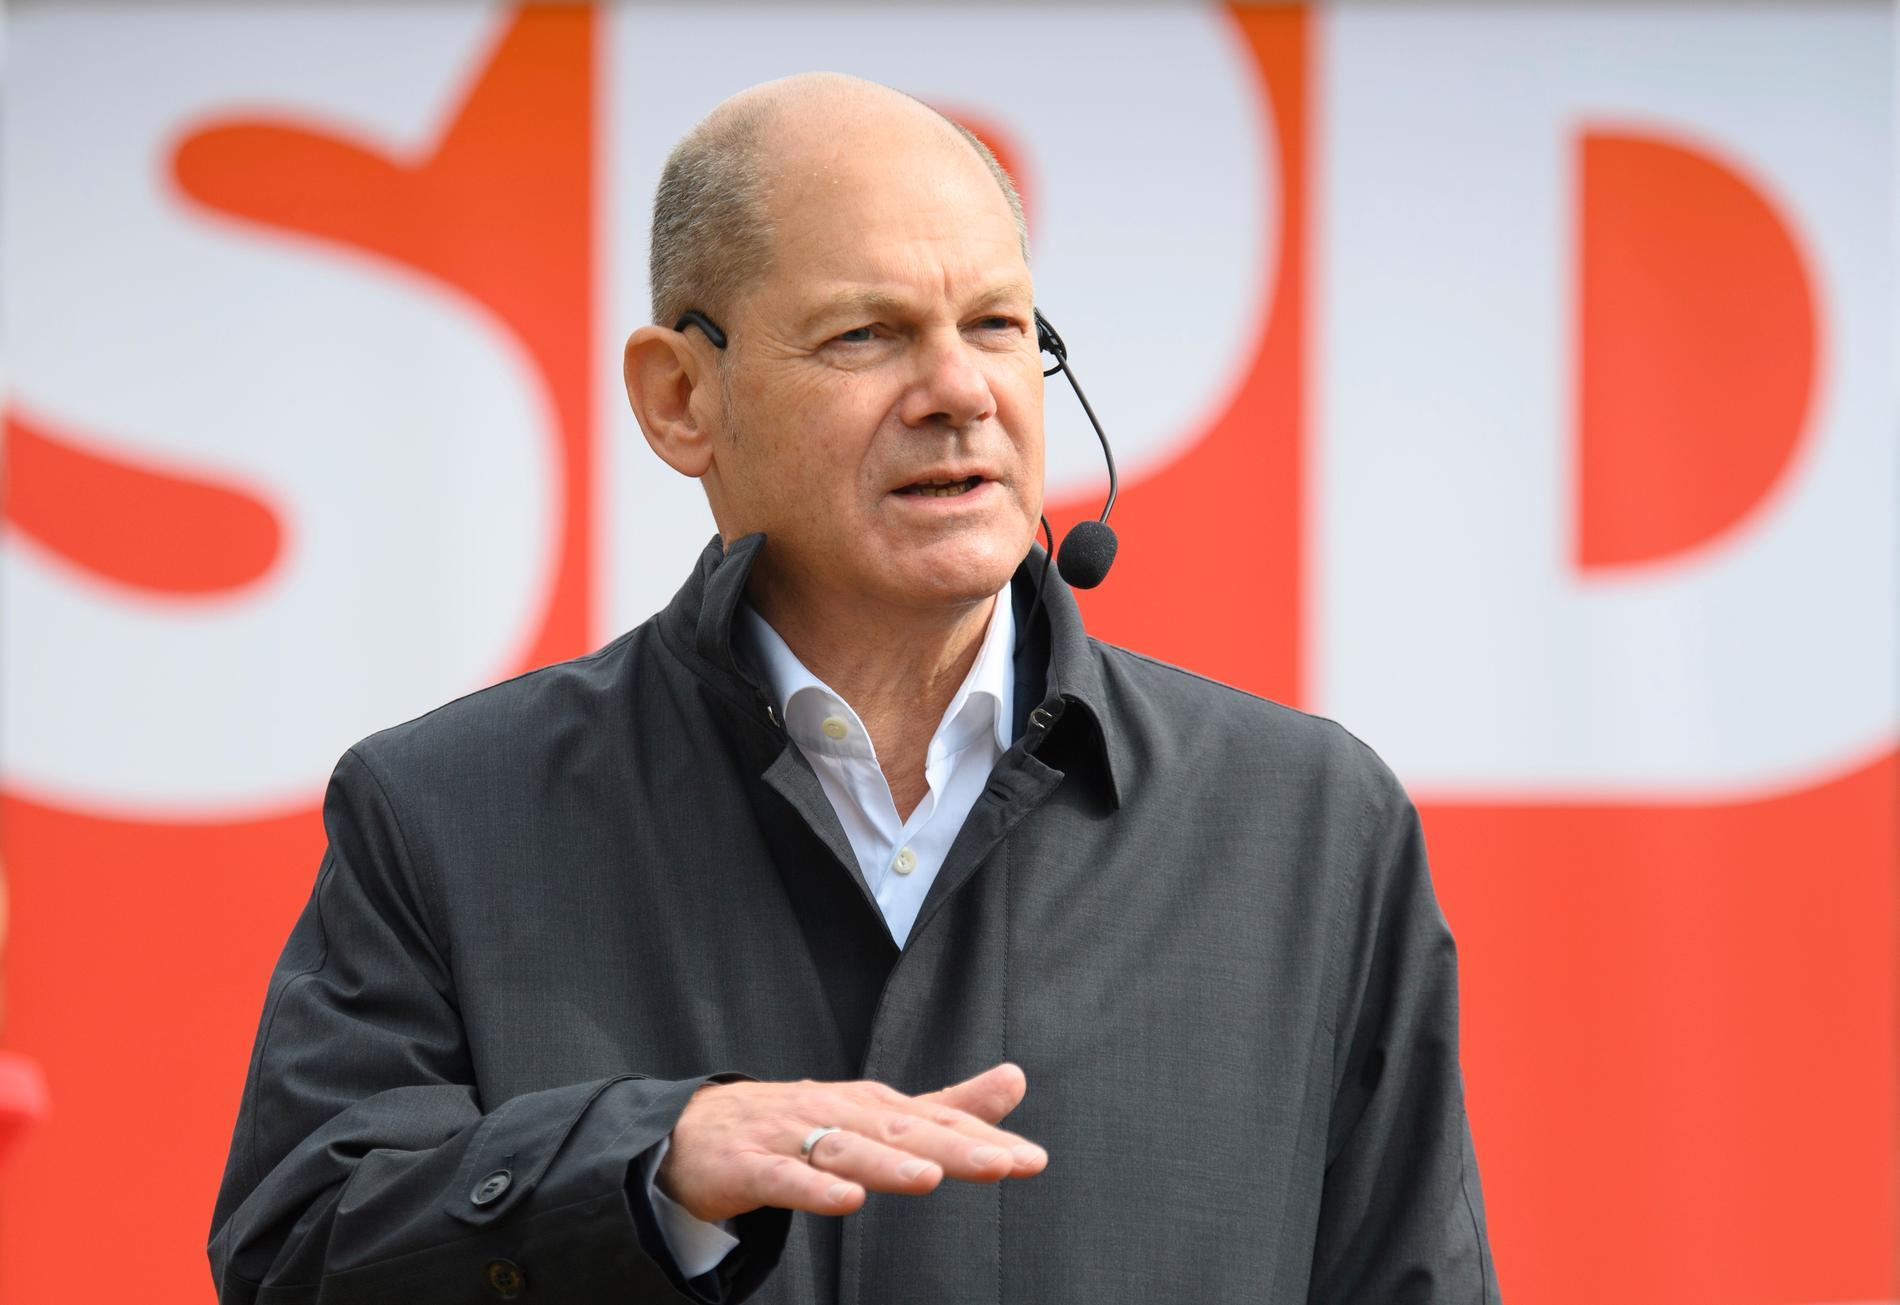 SPD-ledaren Olaf Scholz. Arkivbild.